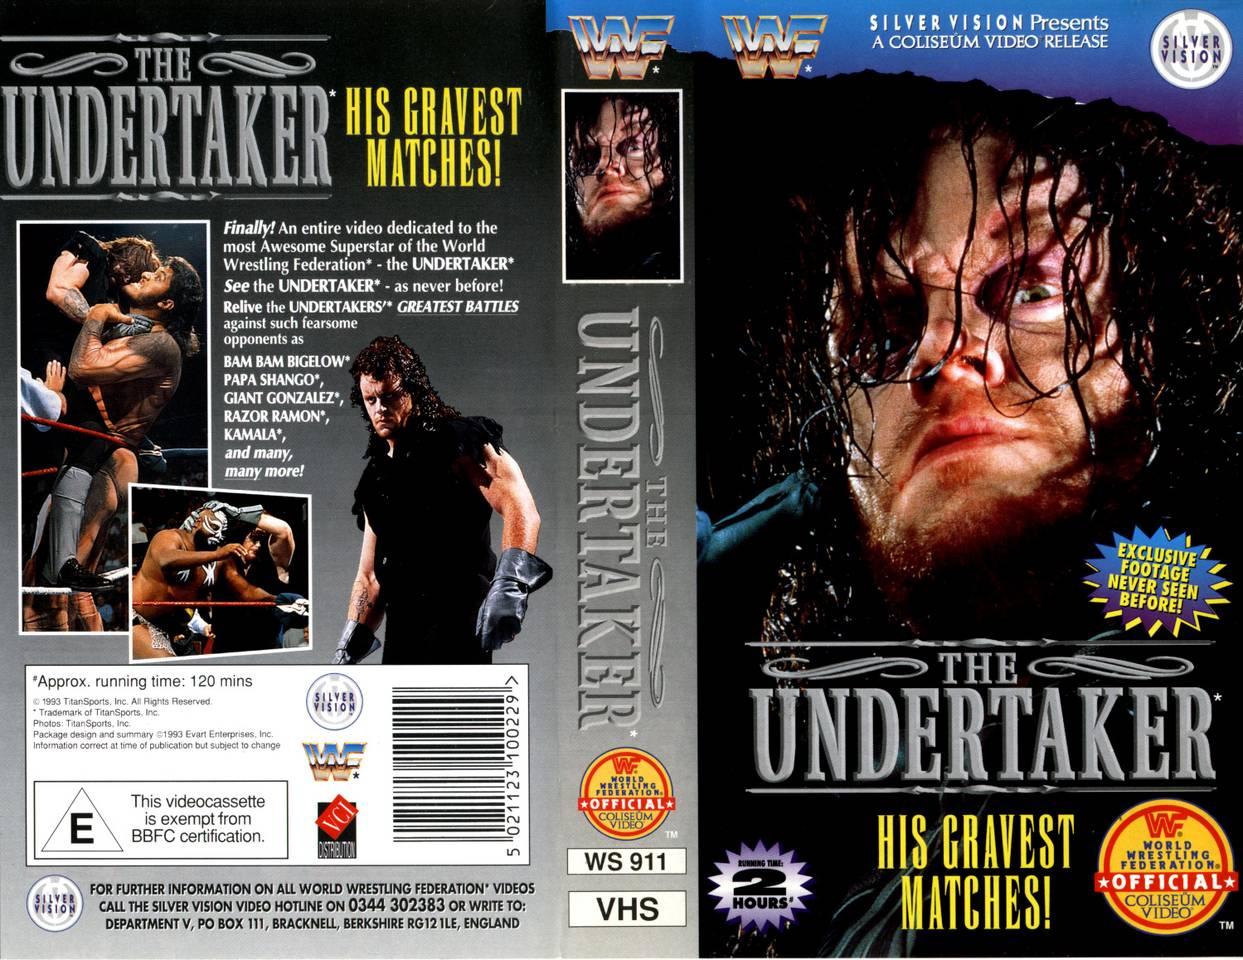 undertakergravestmatches5qa